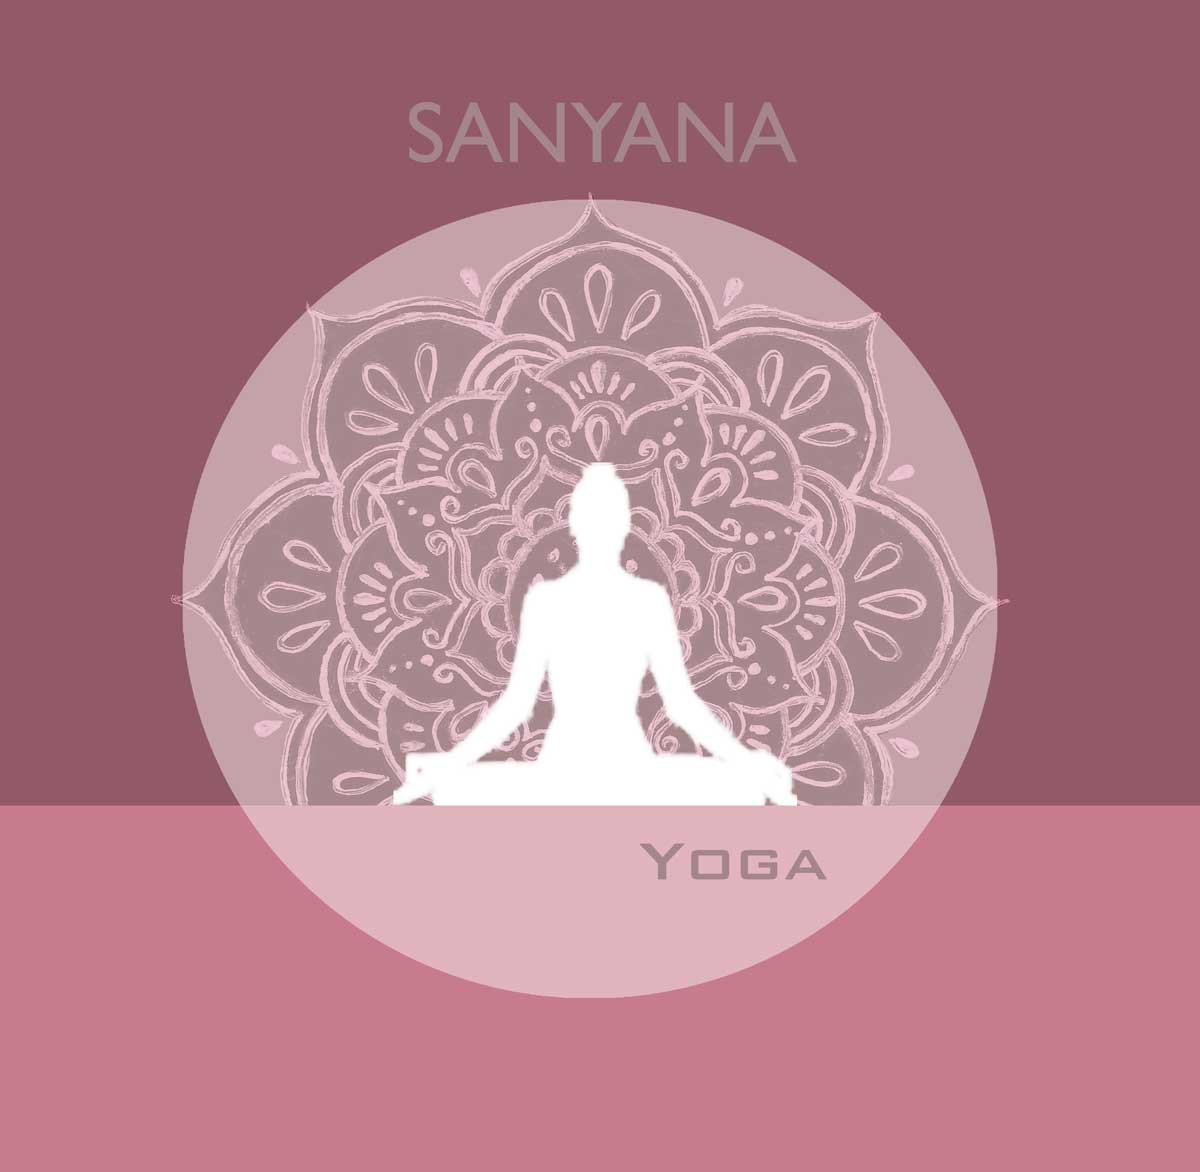 Sanyana Yoga